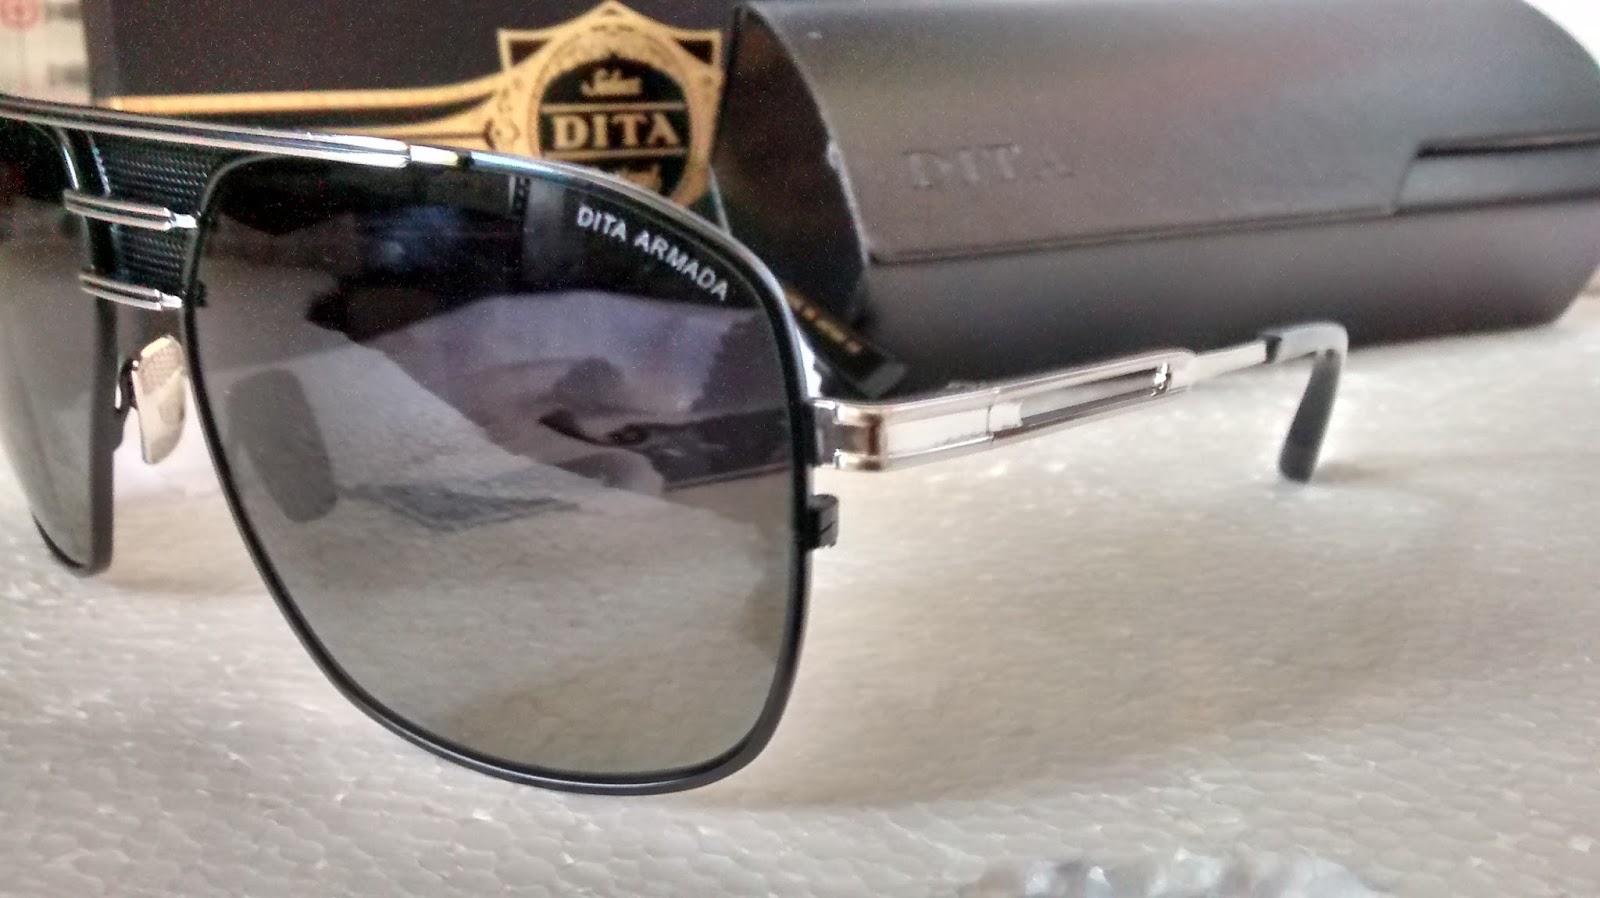 12ef2b28dc DITA Armada Super Black Awesome Sunglasses For Men Rs3700 with DITA ...